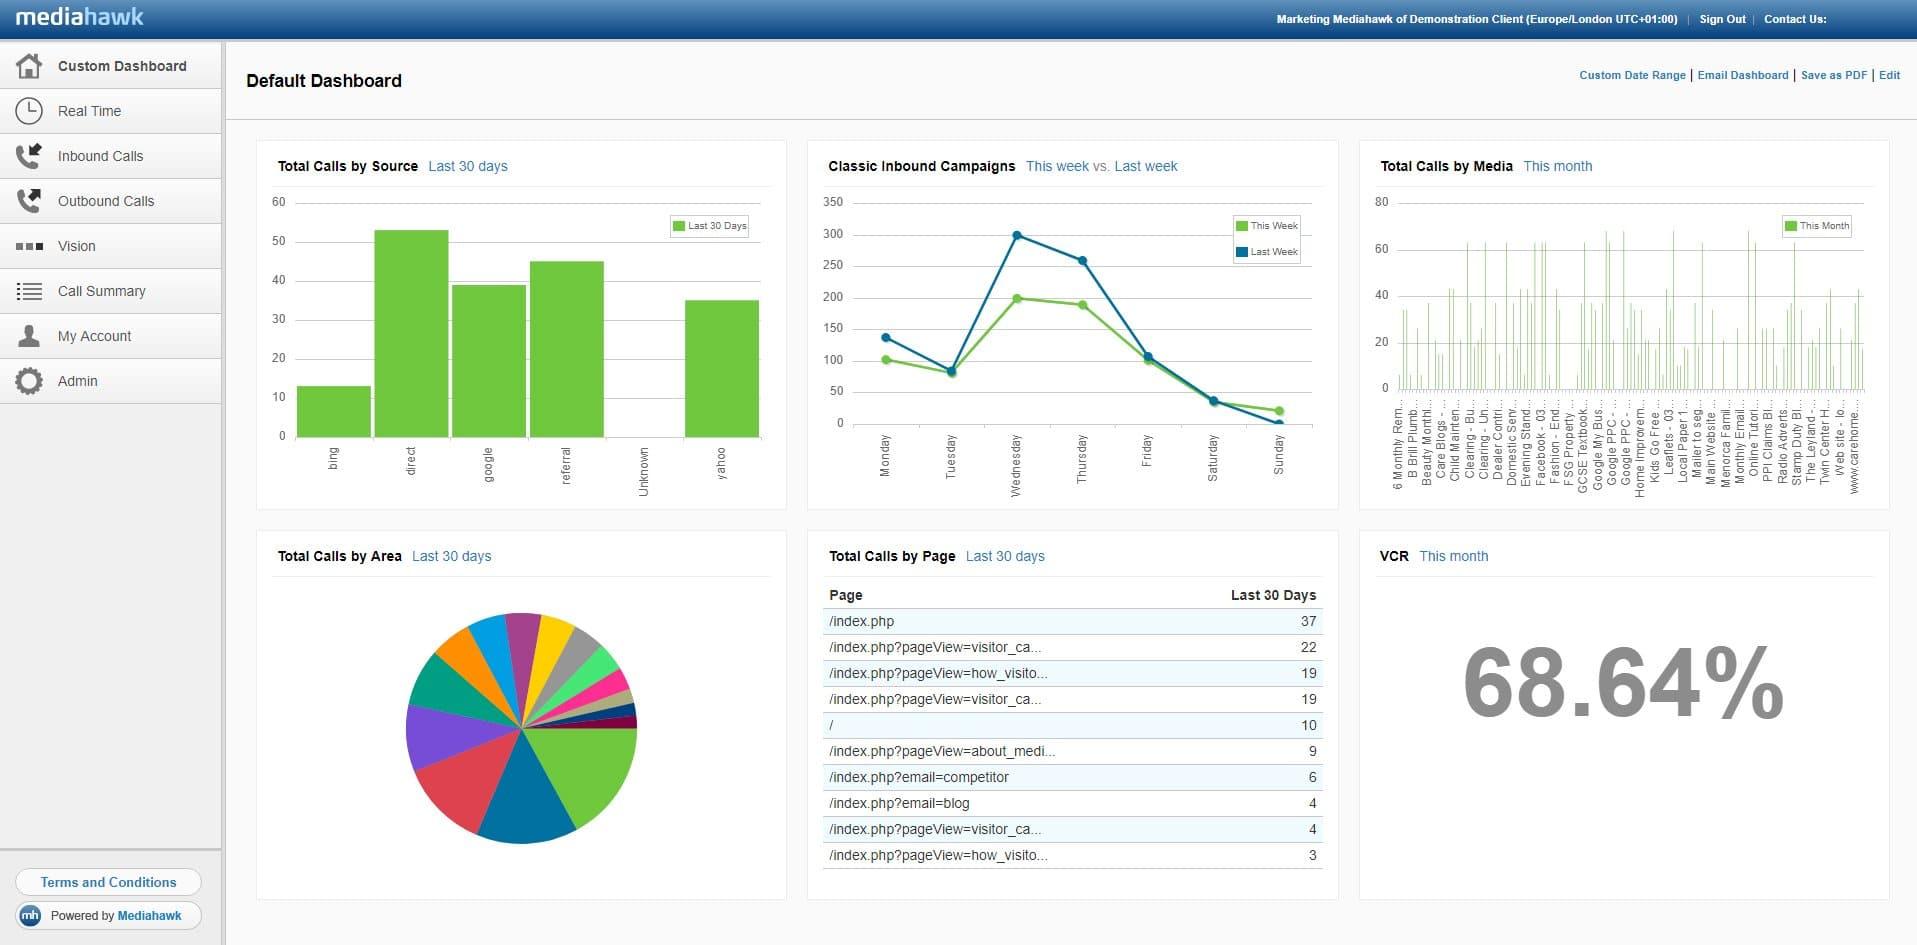 Mediahawk custom dashboard screenshot.